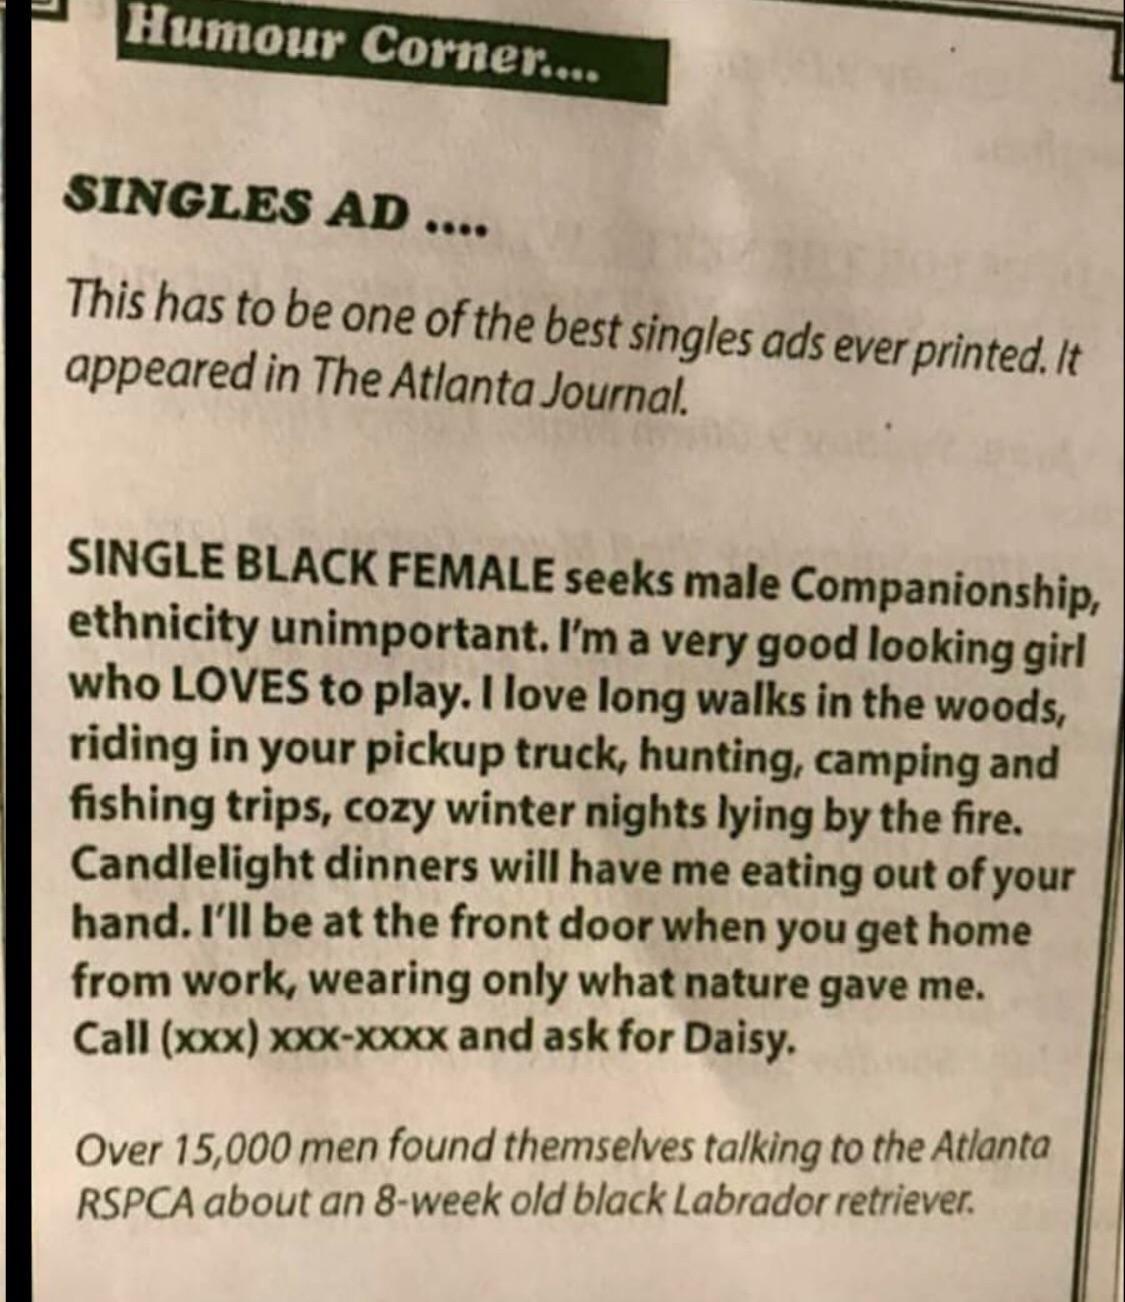 Single Black Female Seeks Male Companionship